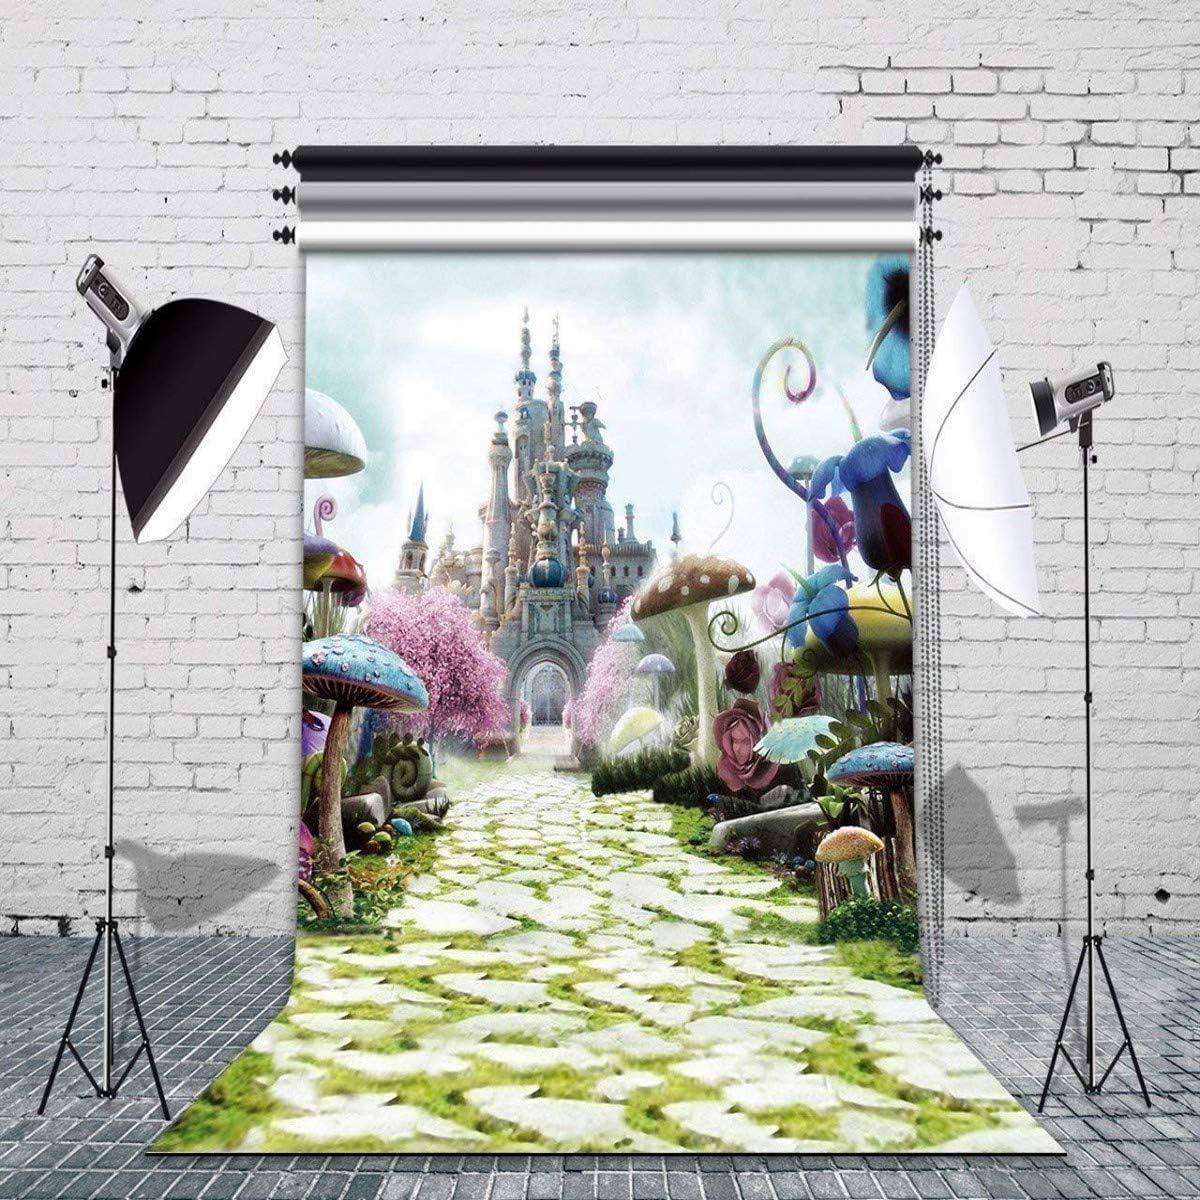 Haoyiyi 9x6ft Spring Cartoon Fairy Tale Castle Dreamy Wonderland Backdrop Backgrpund Photography Kid Children Newborn Birthday Baby Shower Wedding Cake Table Tea Party Wallpaper Poster Decoration